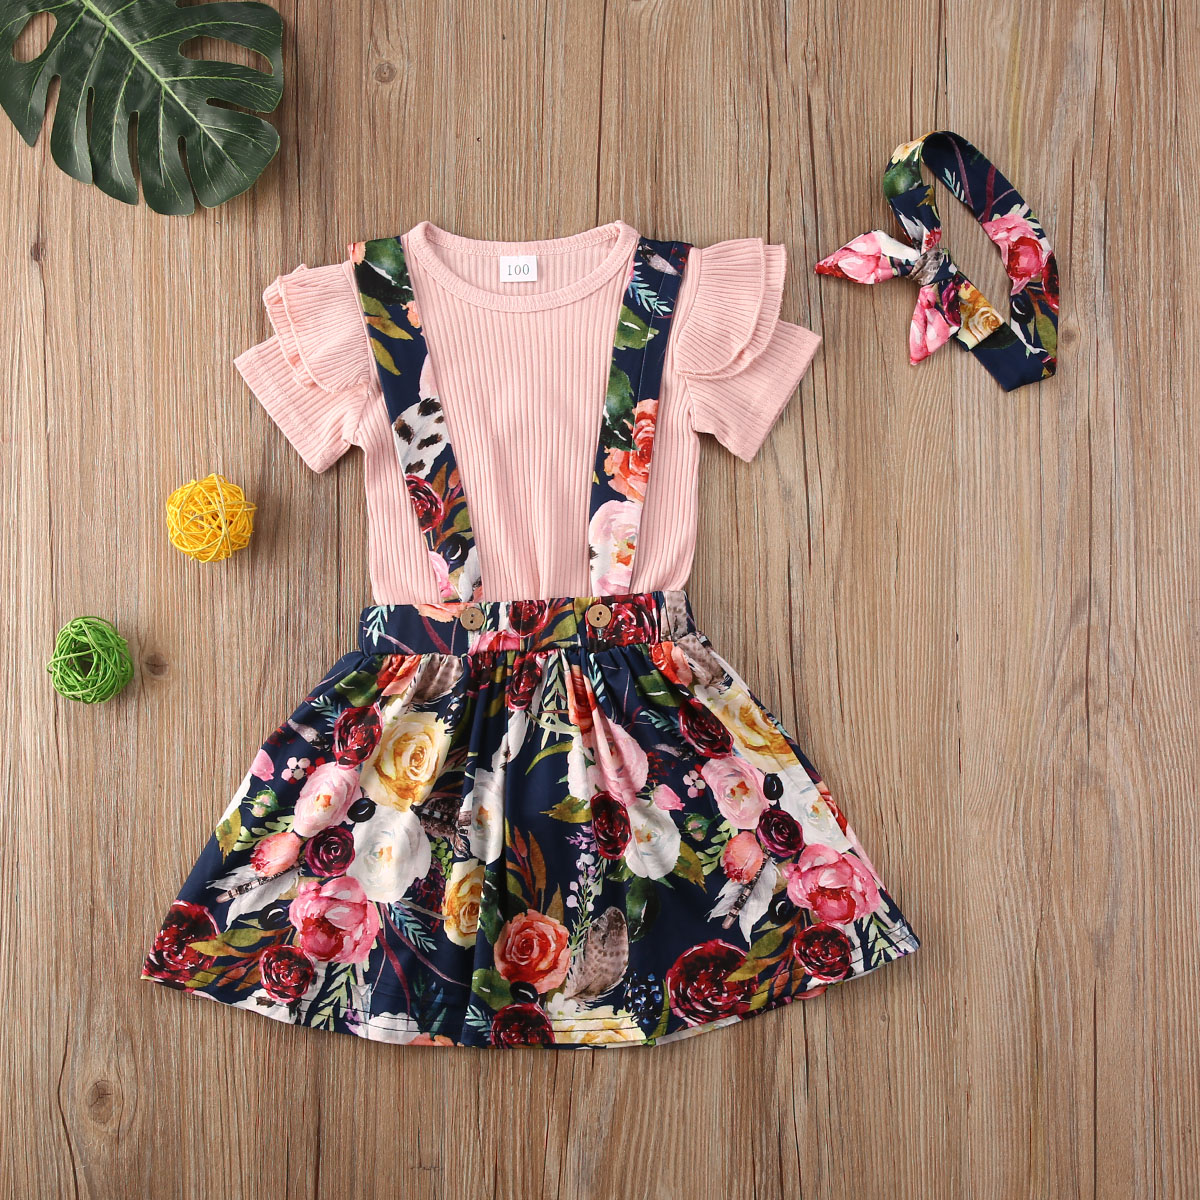 Sweet Kids Baby Girl 18M-5 conjunto de ropa rosa de manga corta Camiseta Tops + faldas de Liga Floral 3 uds trajes ropa Casual